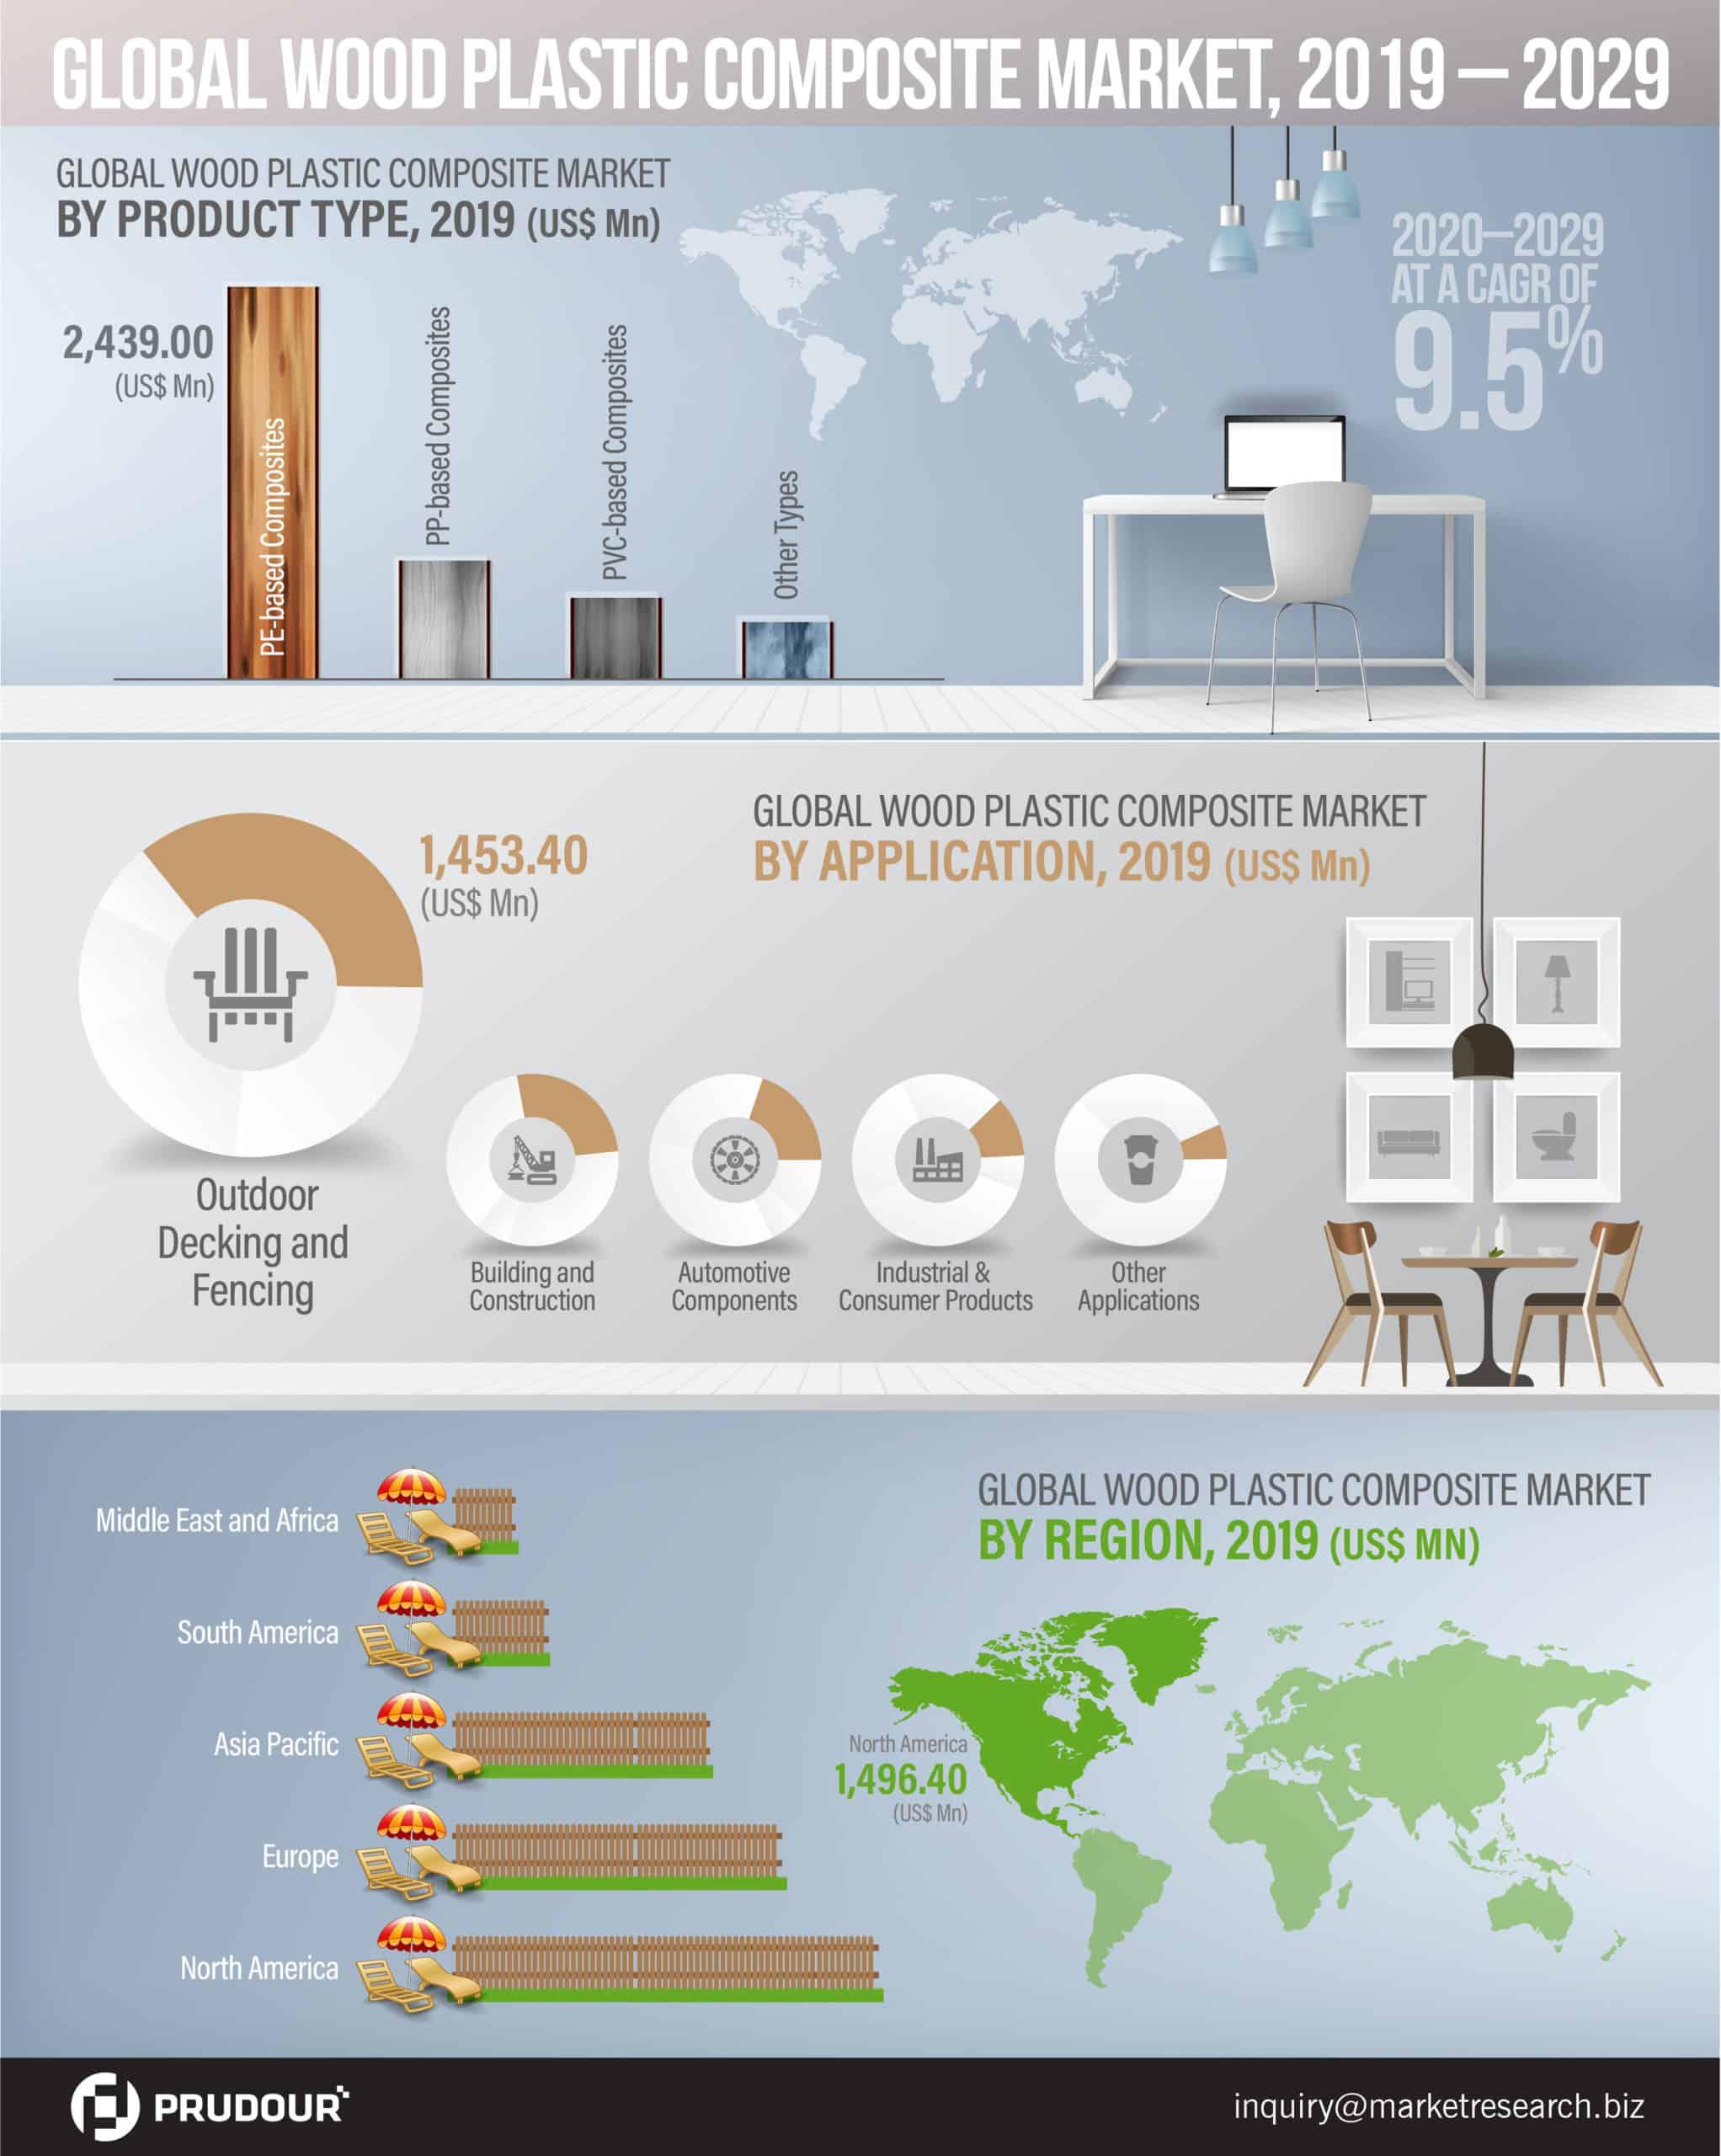 Global Wood Plastic Composite Market